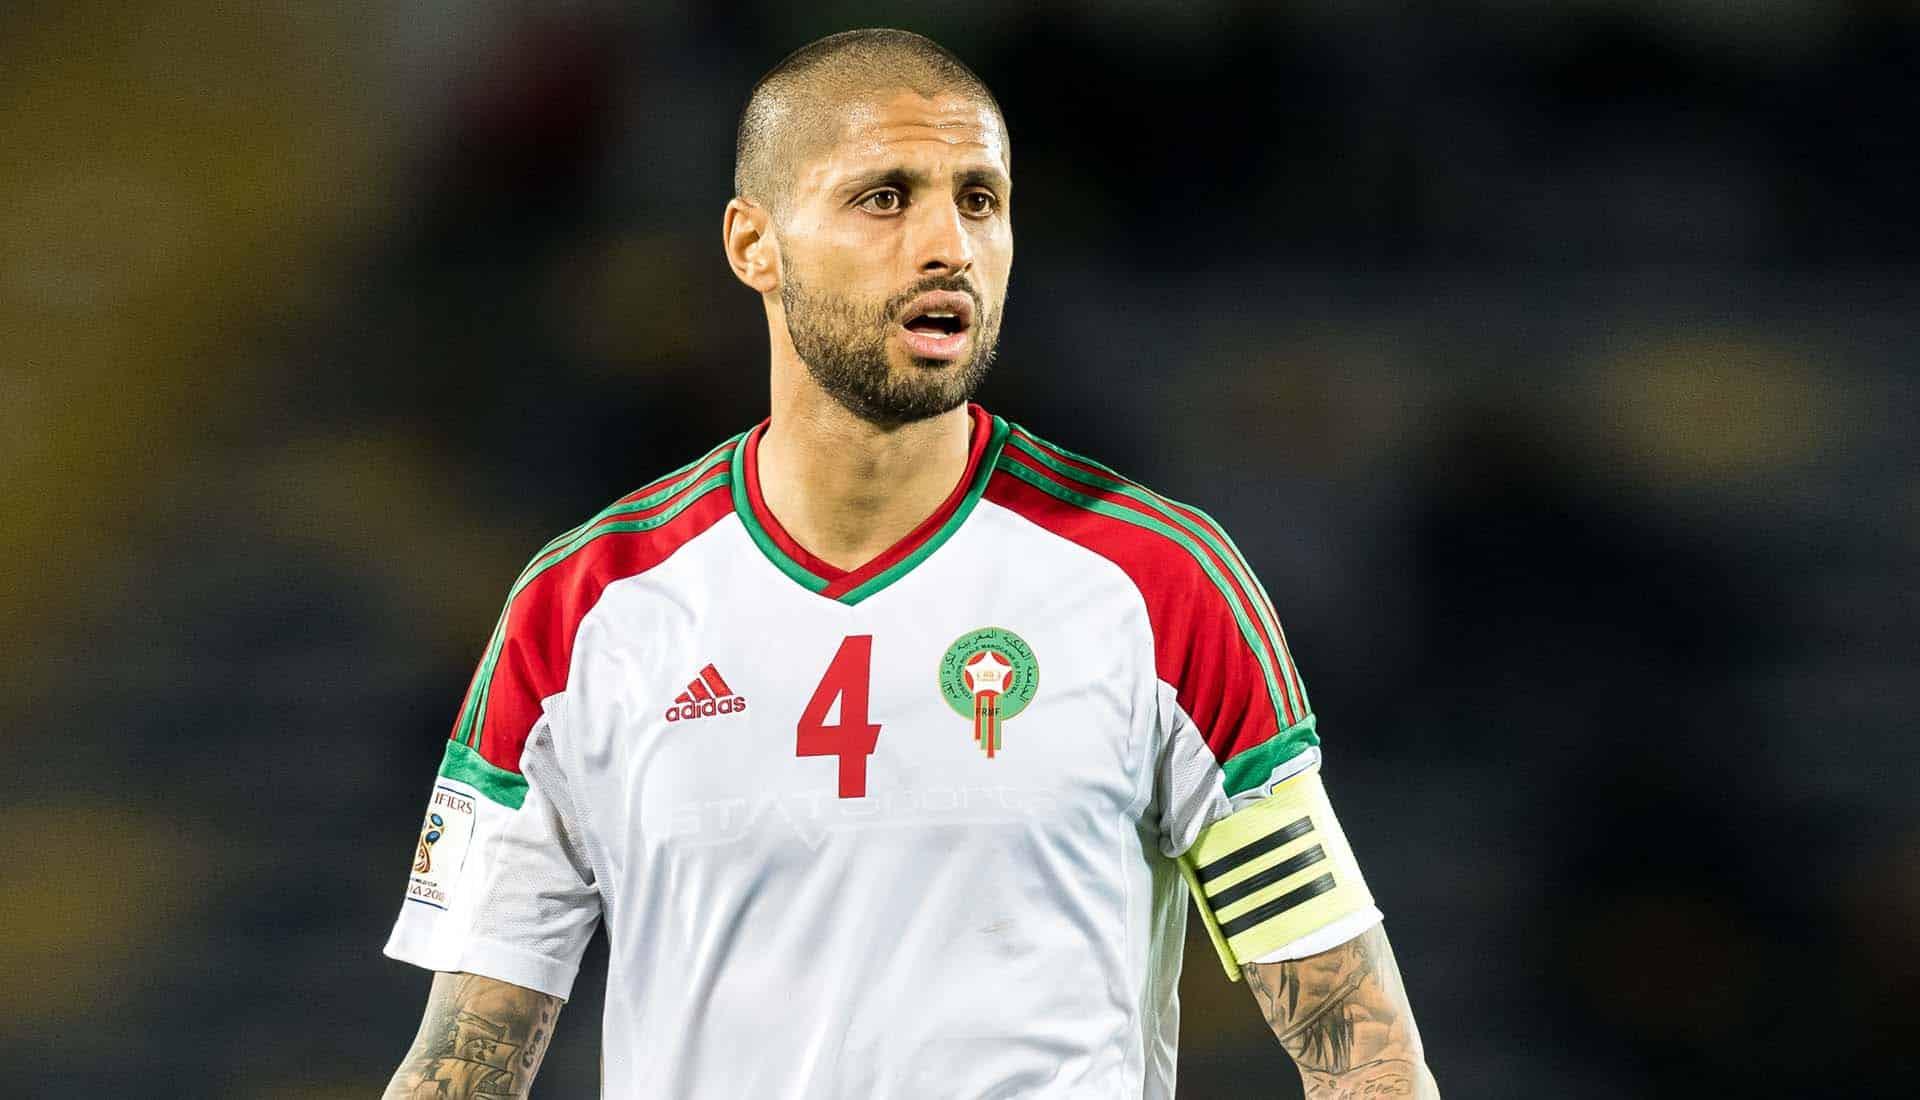 maillot-football-adidas-maroc-raison-retard-lancement-img2